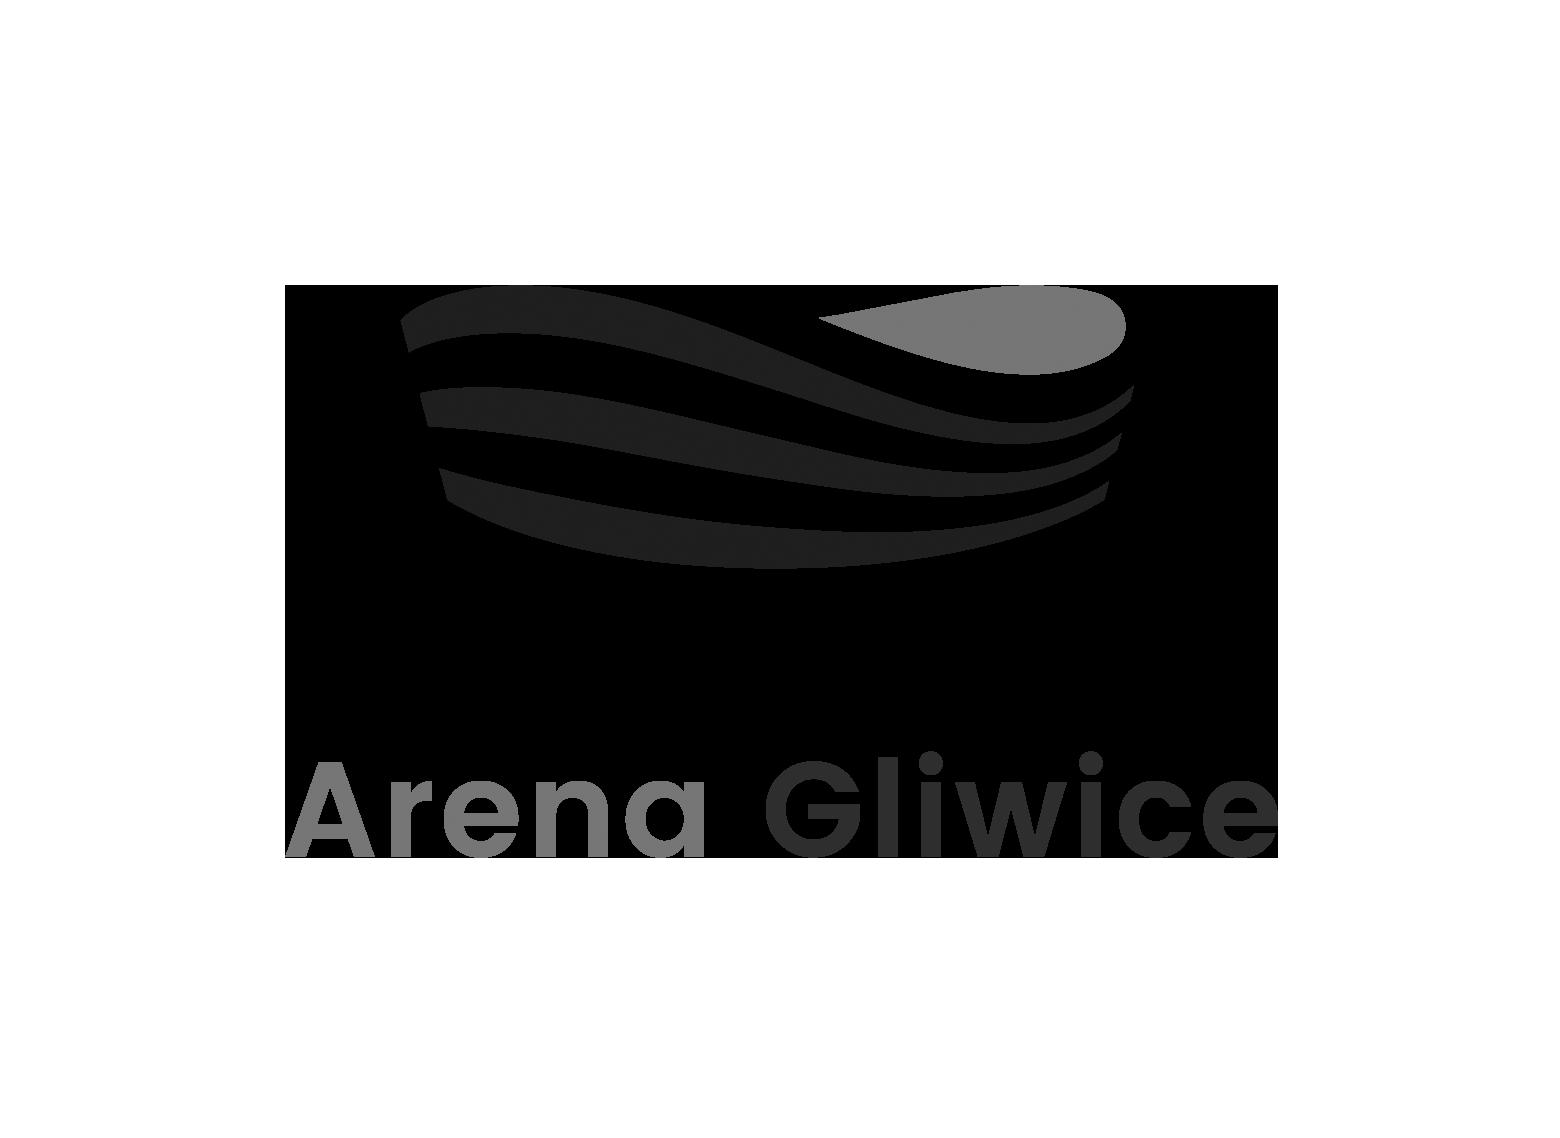 logo color arena gliwice bez tła